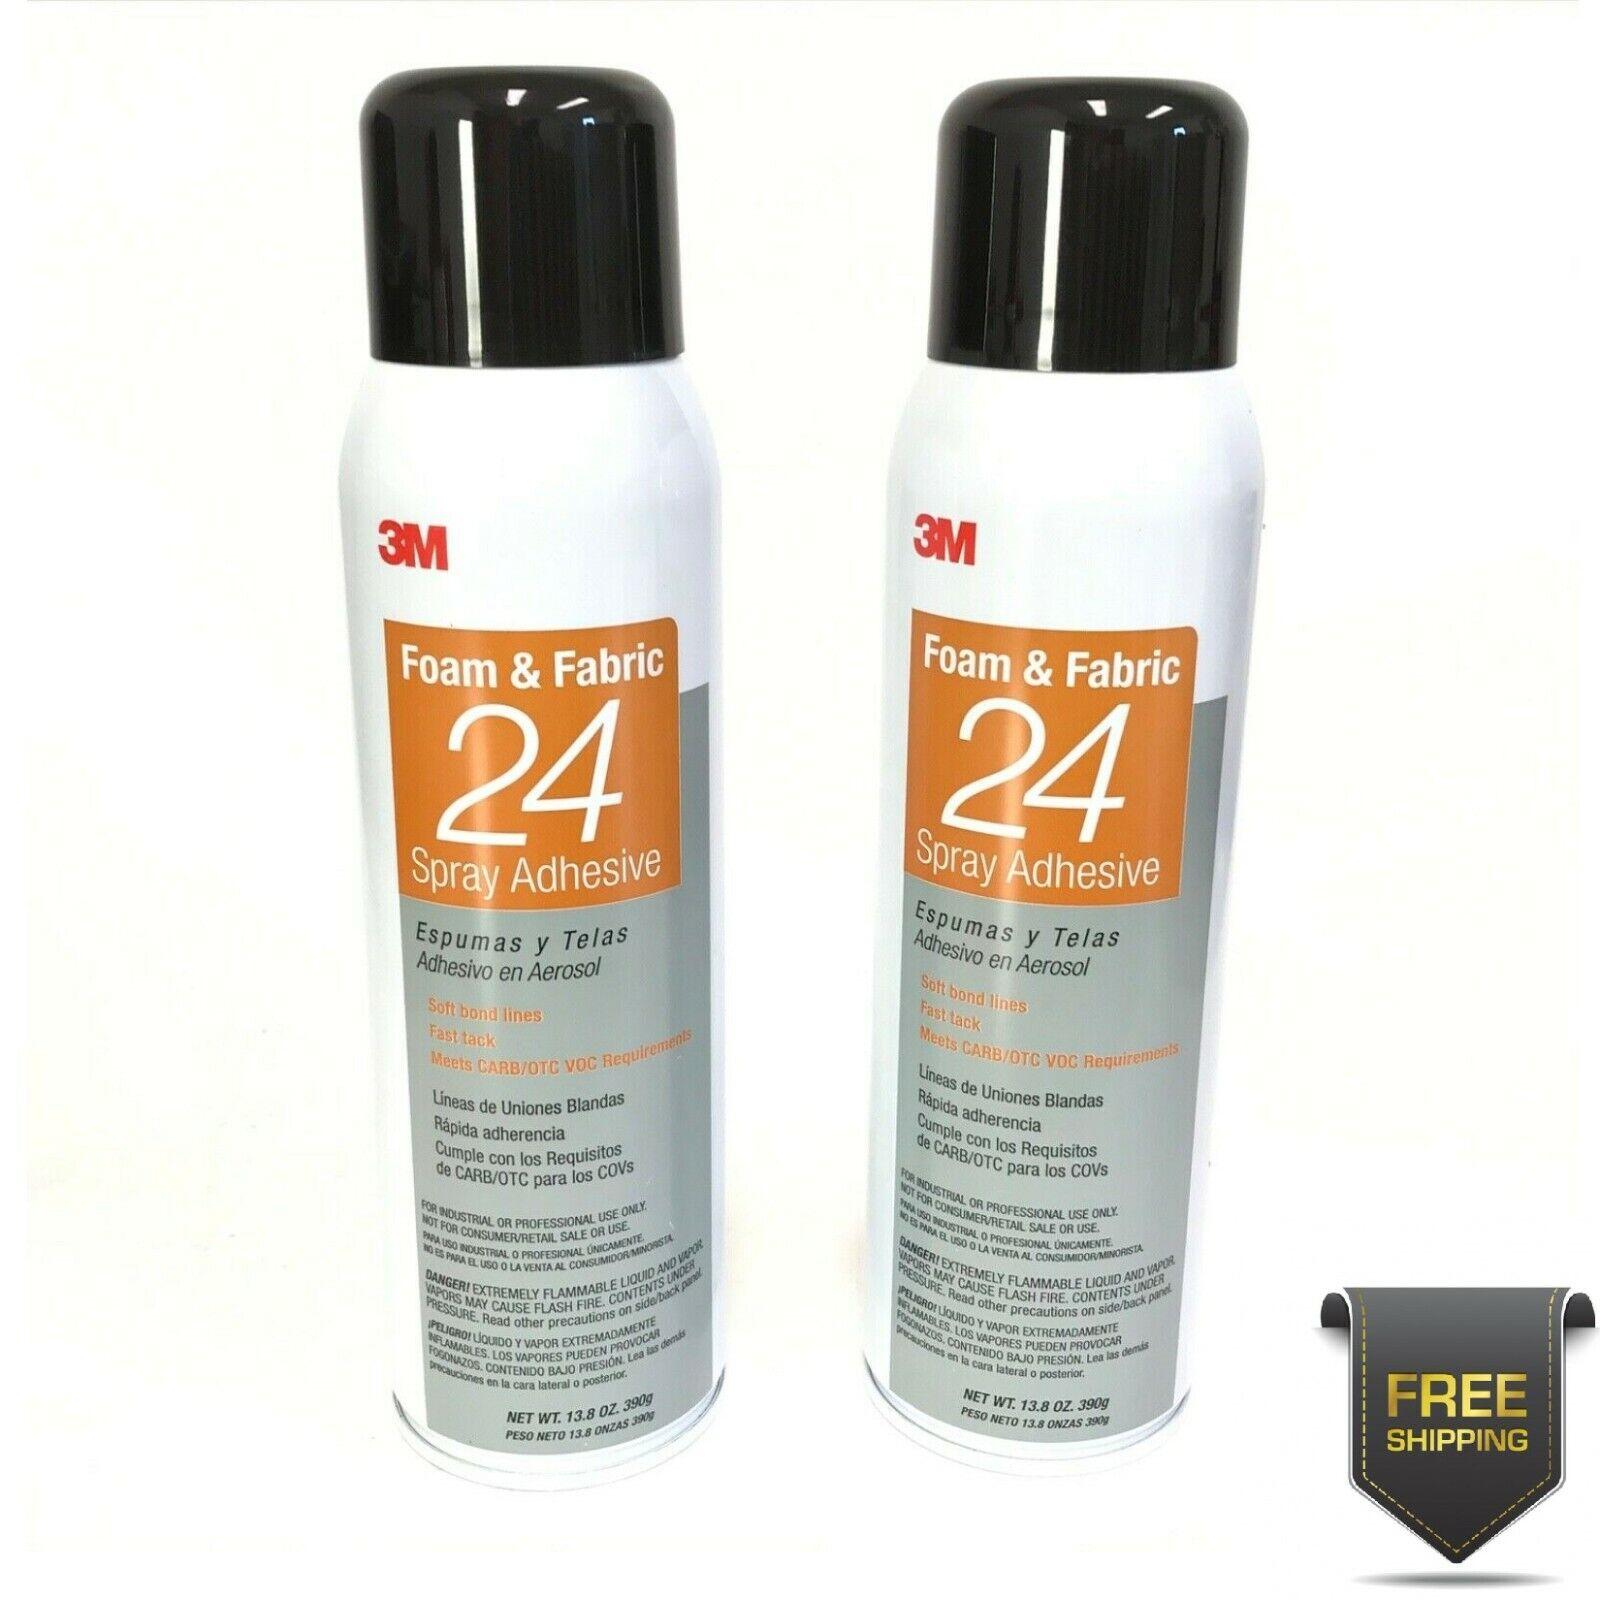 foam fabric 24 spray adhesive 2 pack